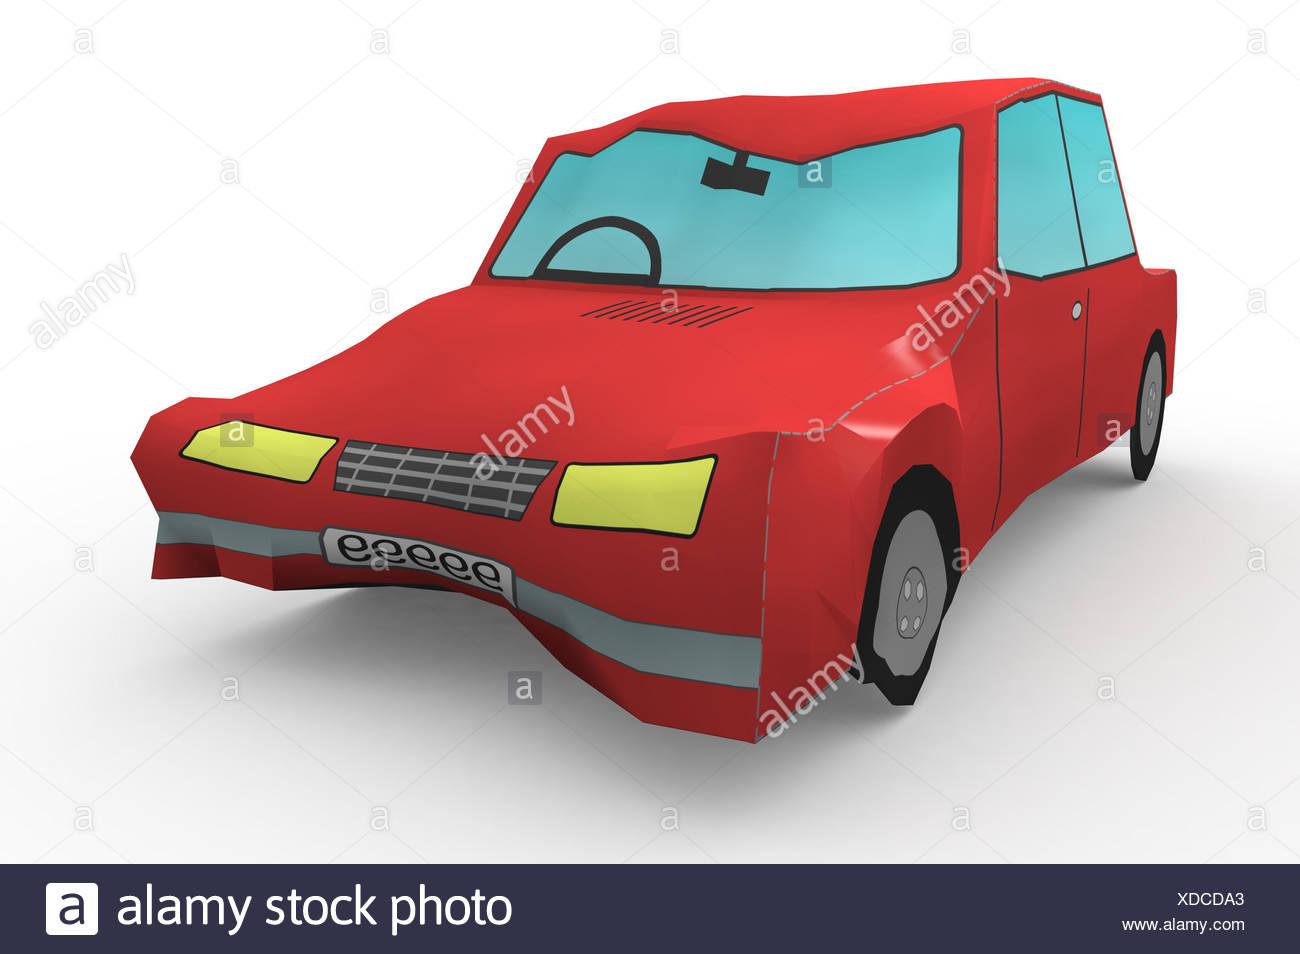 crashed car isolated stockfotos crashed car isolated. Black Bedroom Furniture Sets. Home Design Ideas